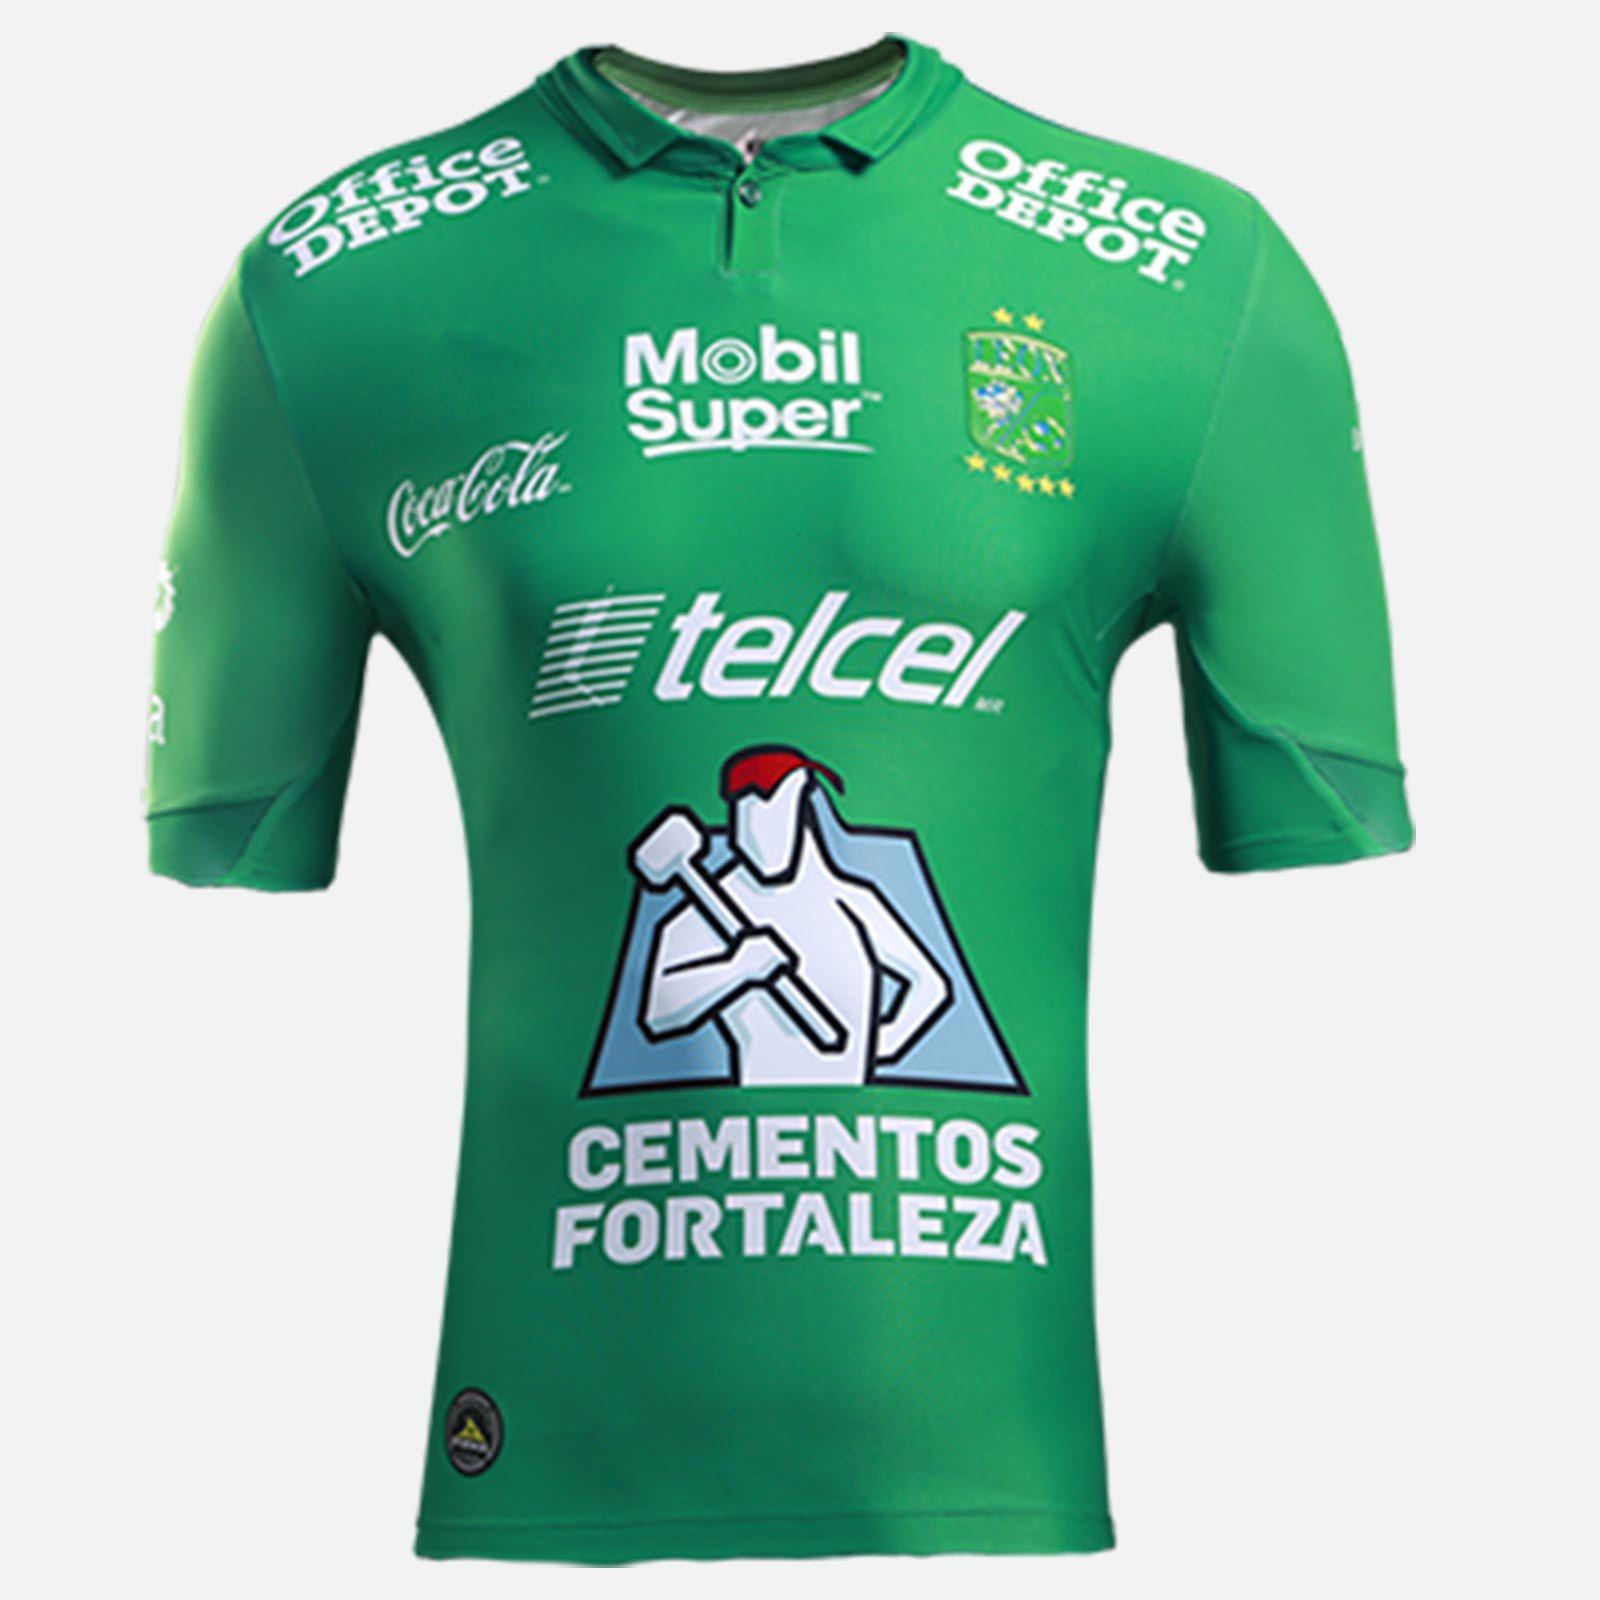 promo code a6470 60a1d Pin on cheap Club Leon FC soccer jerseys shirts